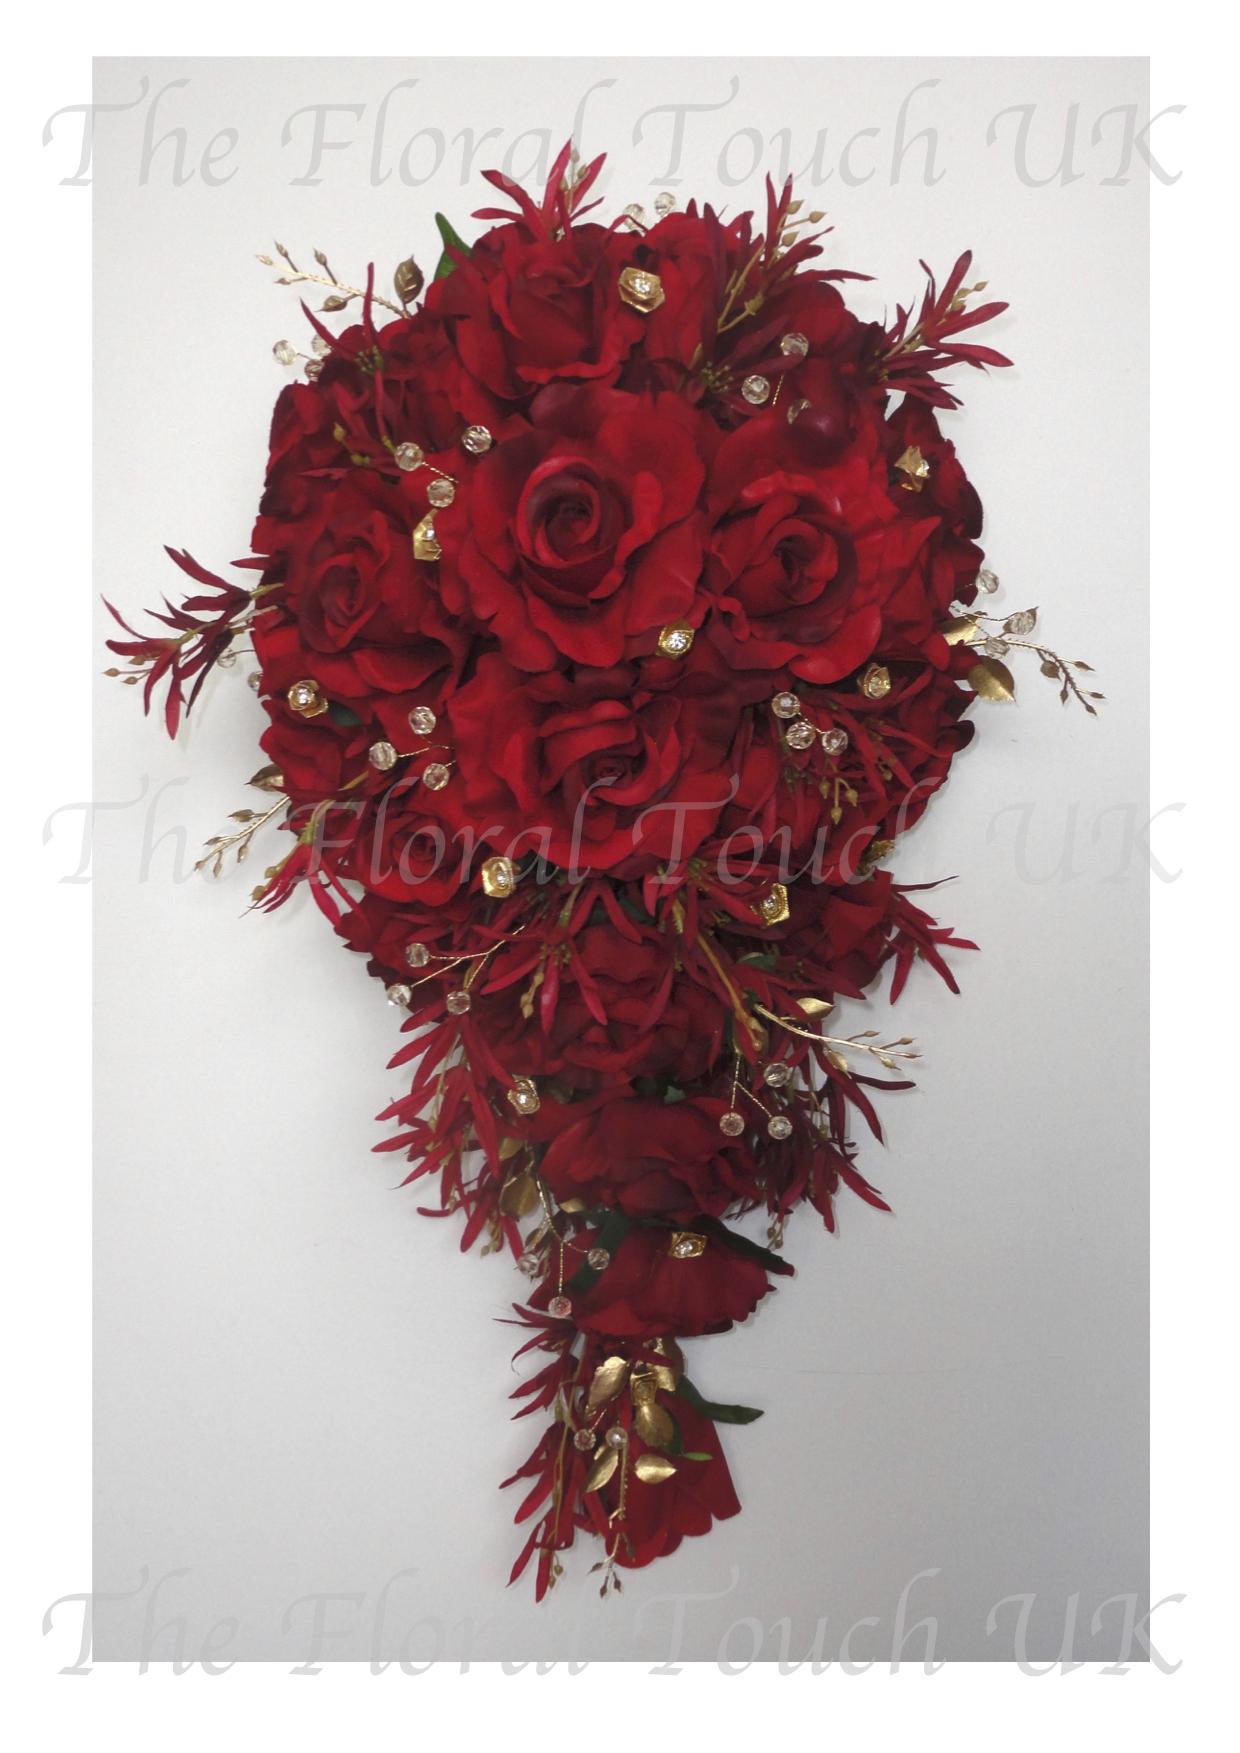 Bridal Shower Bouquets   Teardrop Wedding Bouquets  The ... - photo#35